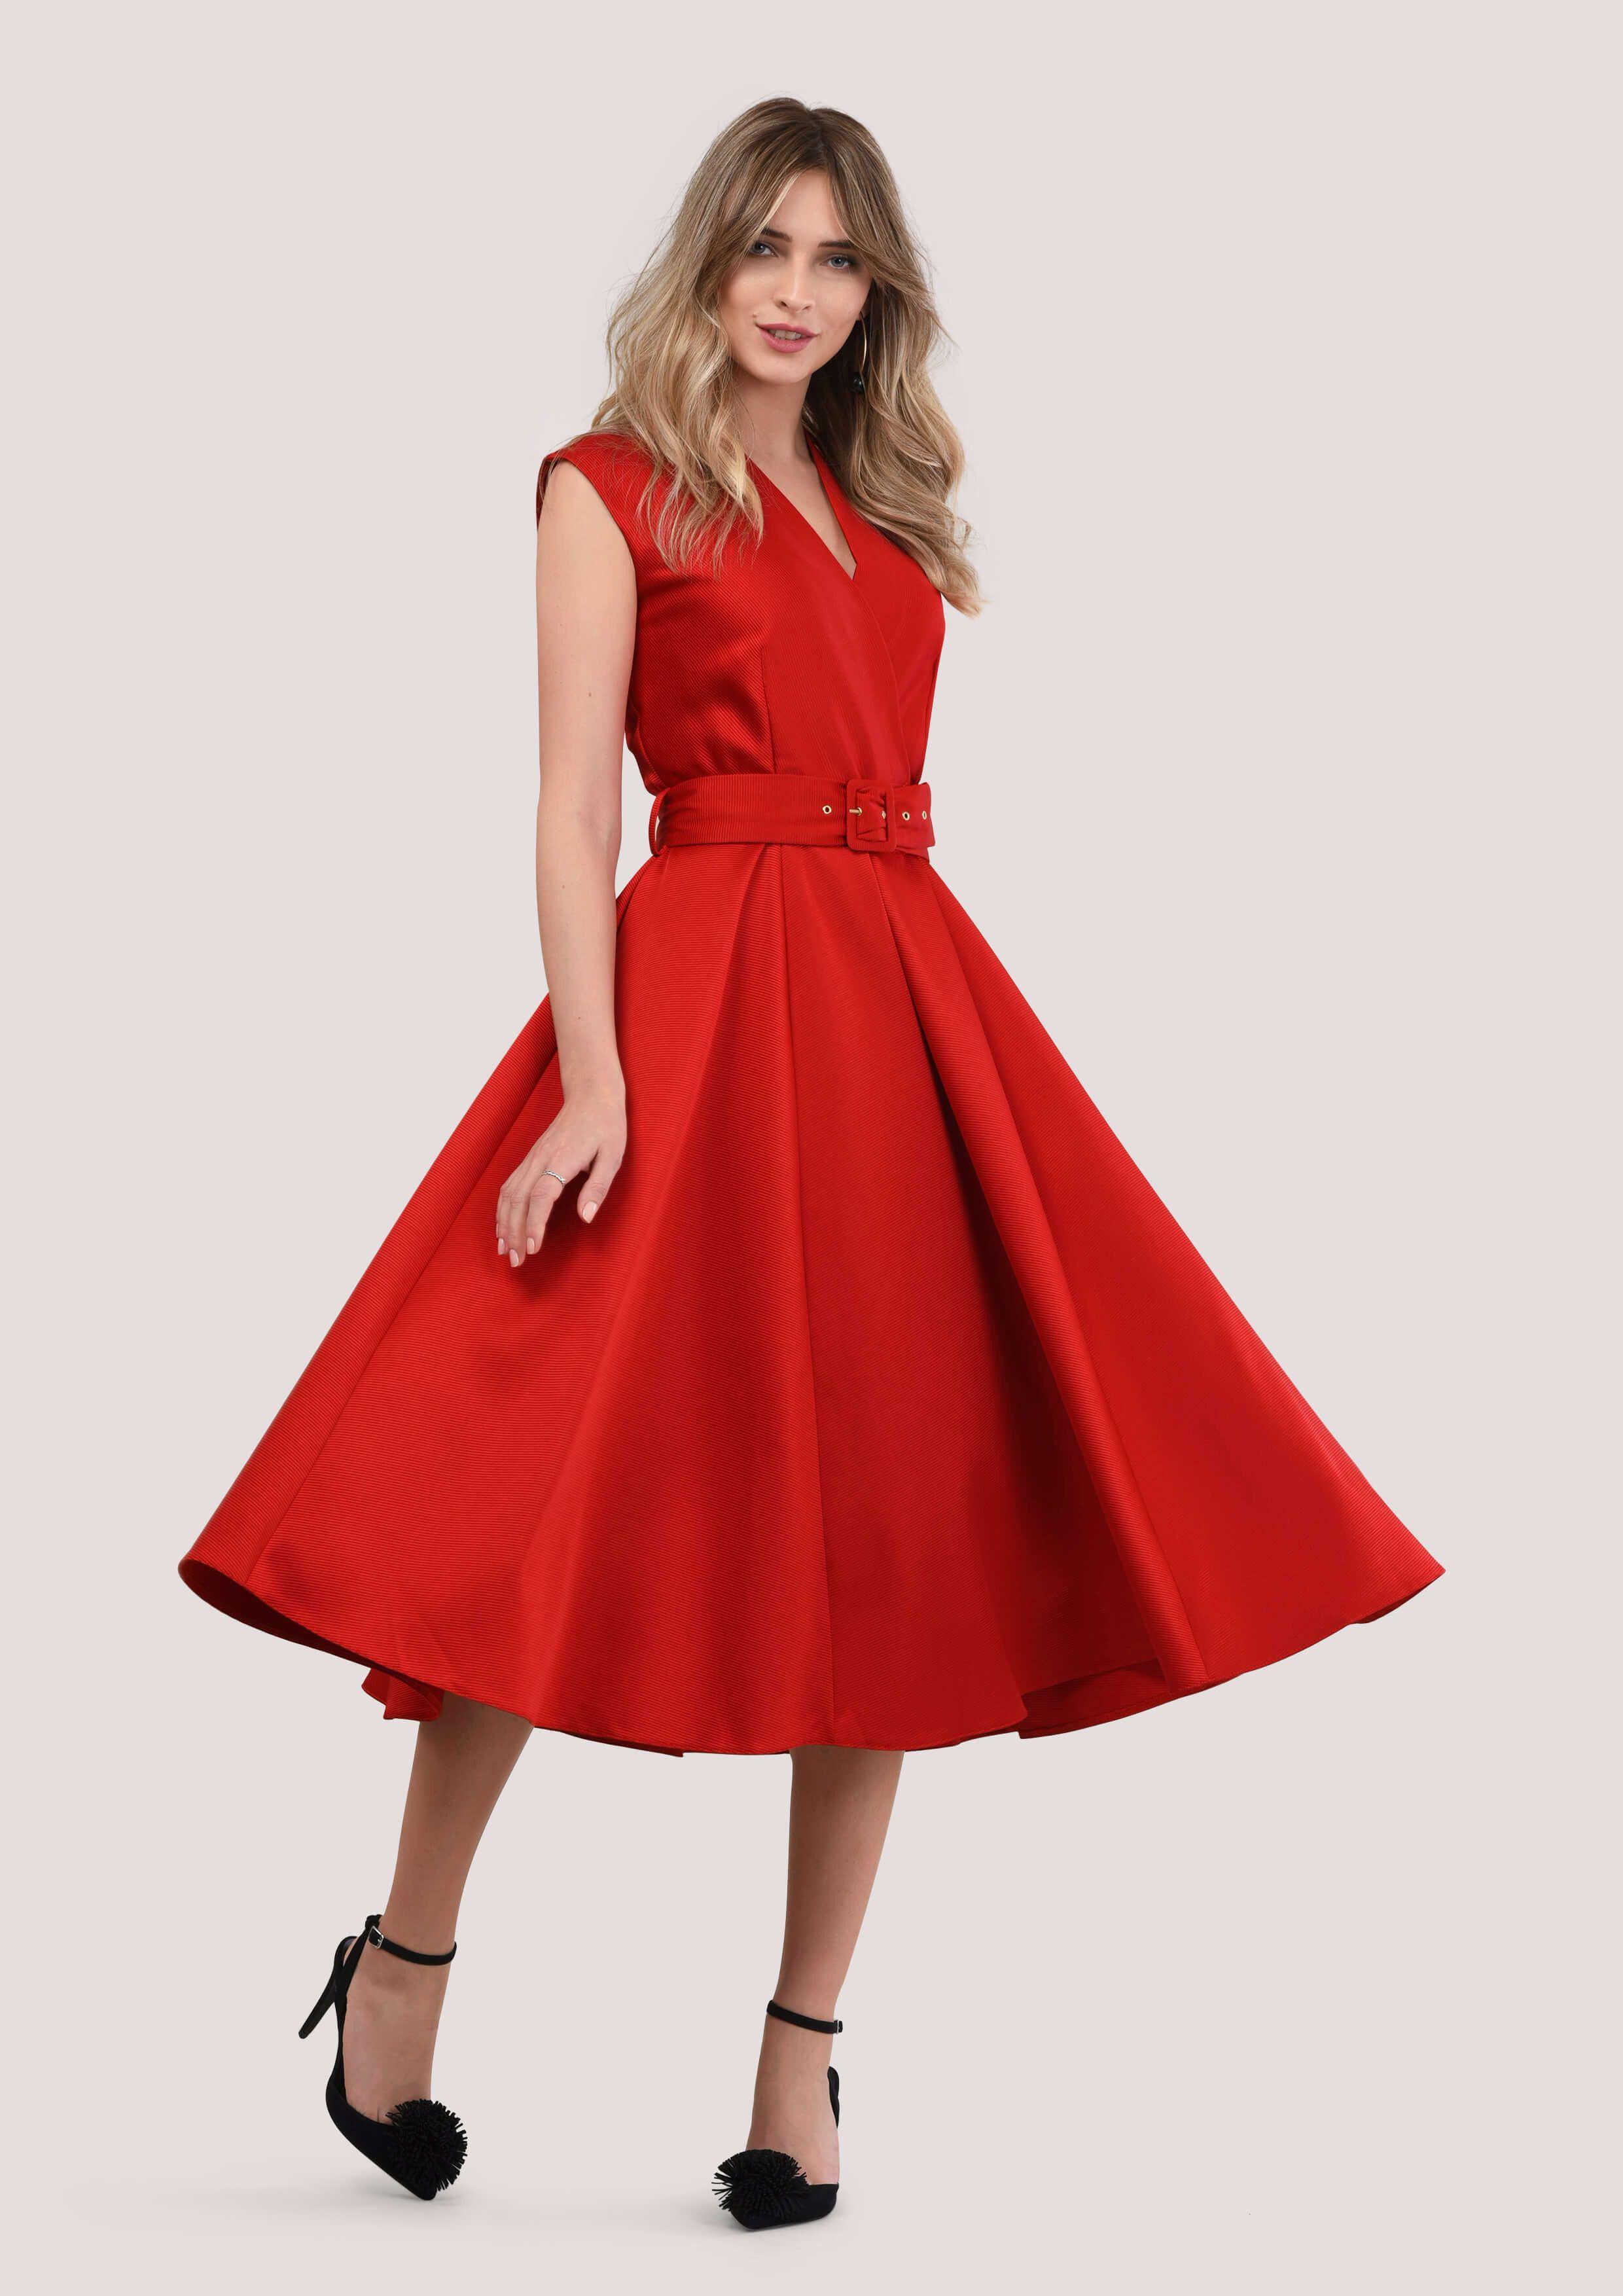 rachel parcell dress poshmark